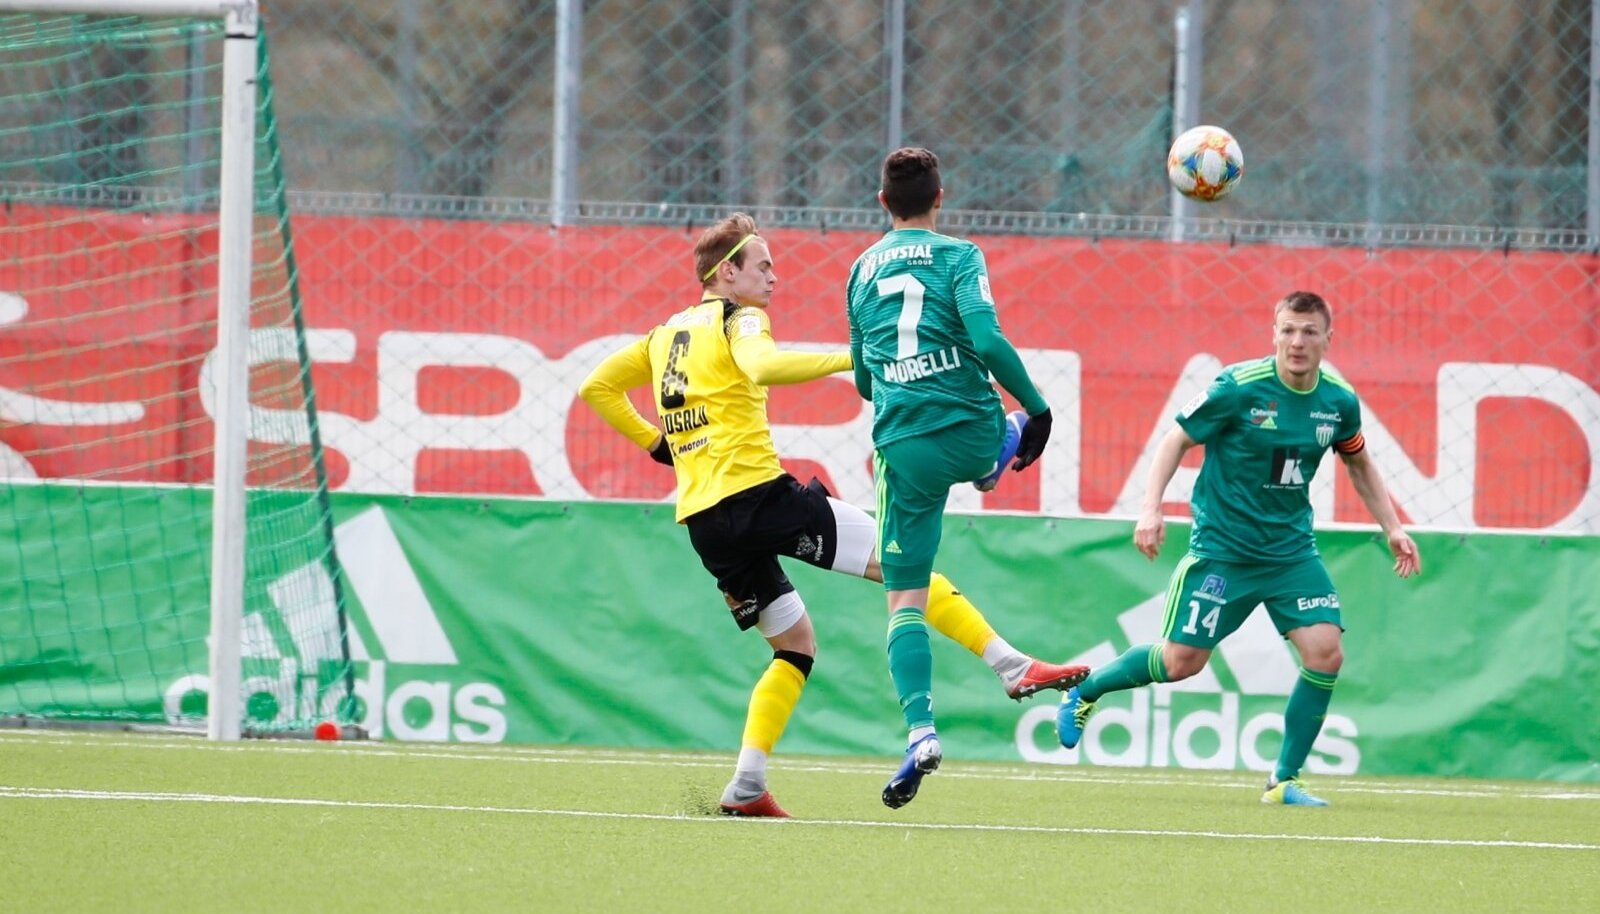 Dmitri Kruglov (nr 14) Sportland Arenal mängus Viljandi Tuleviku vastu.